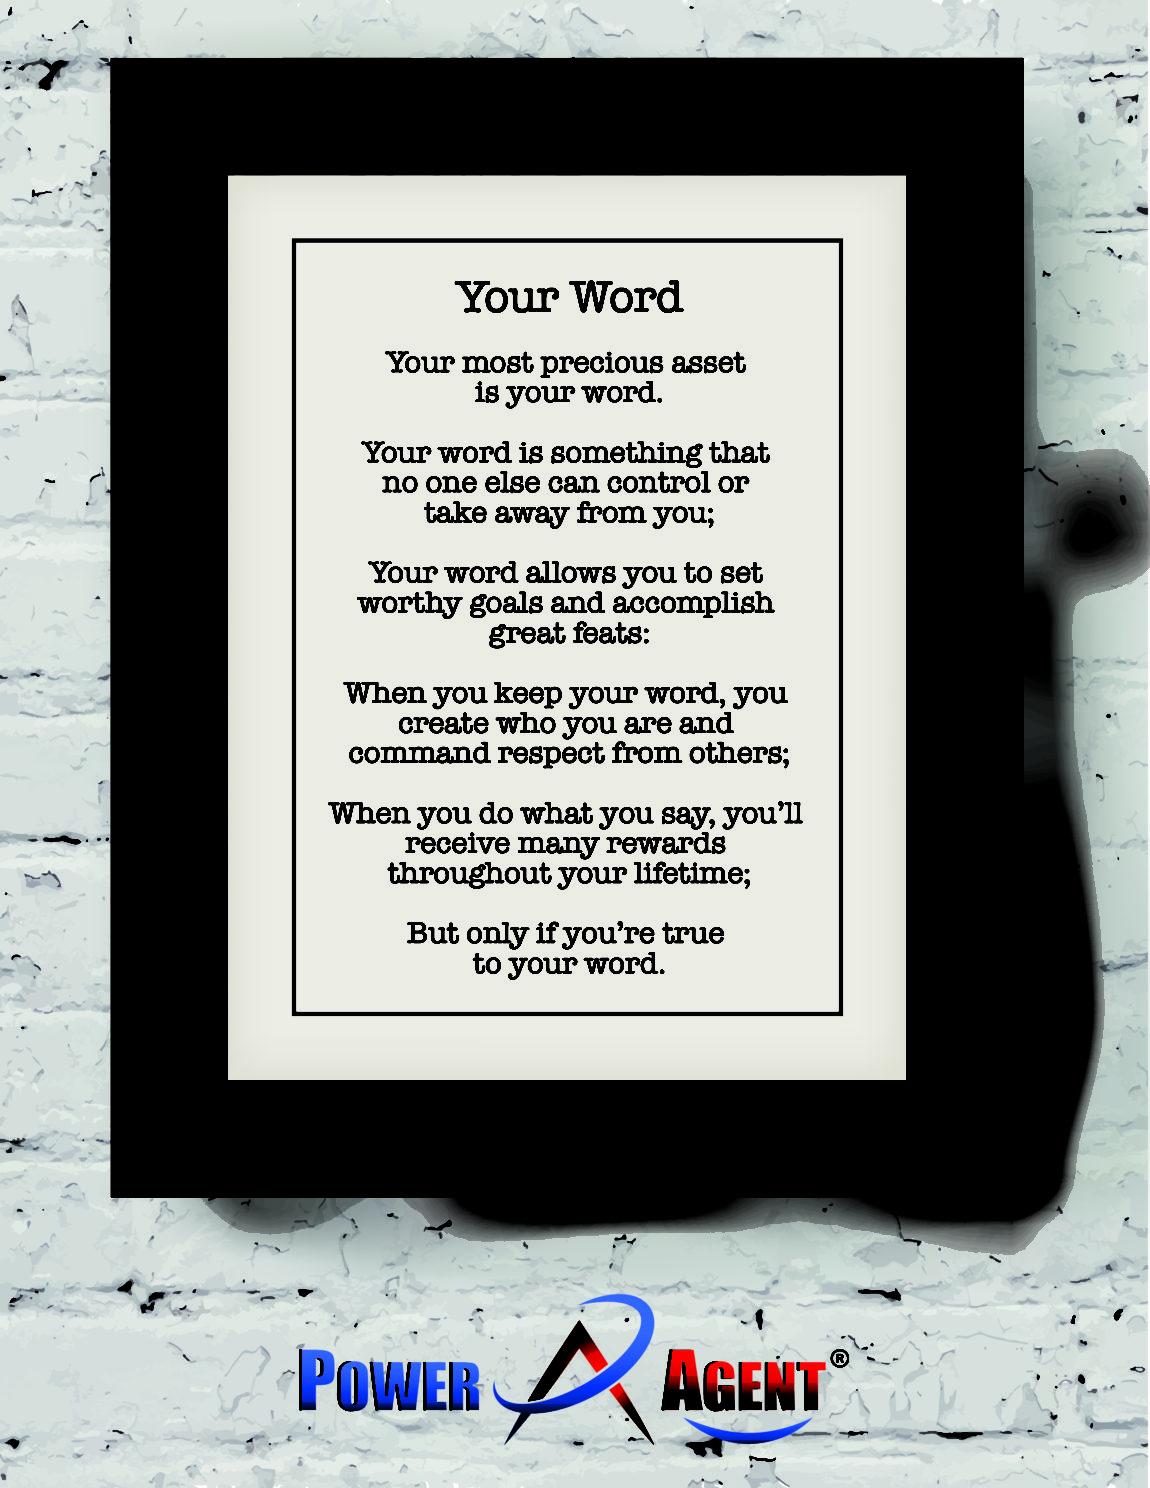 PA-YourWord-01.jpg